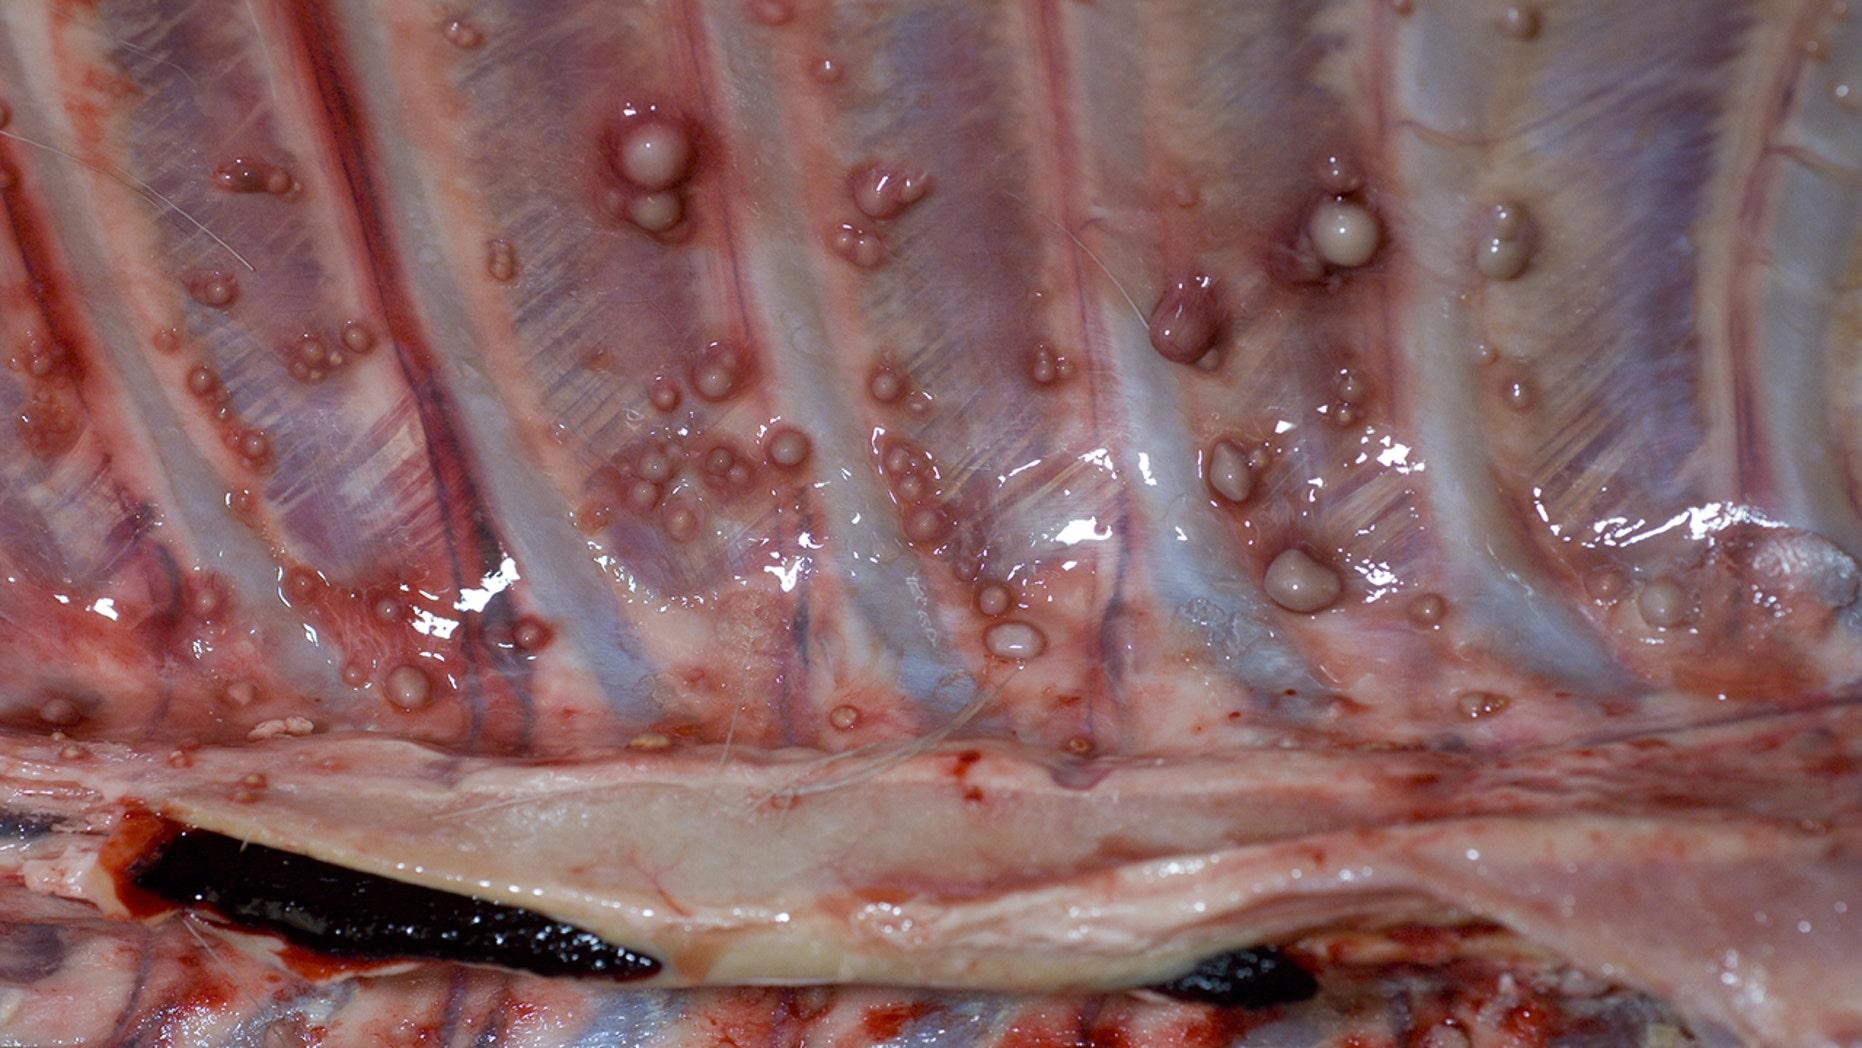 Don't eat deer that looks like this, bovine tuberculosis in MI  deer class=